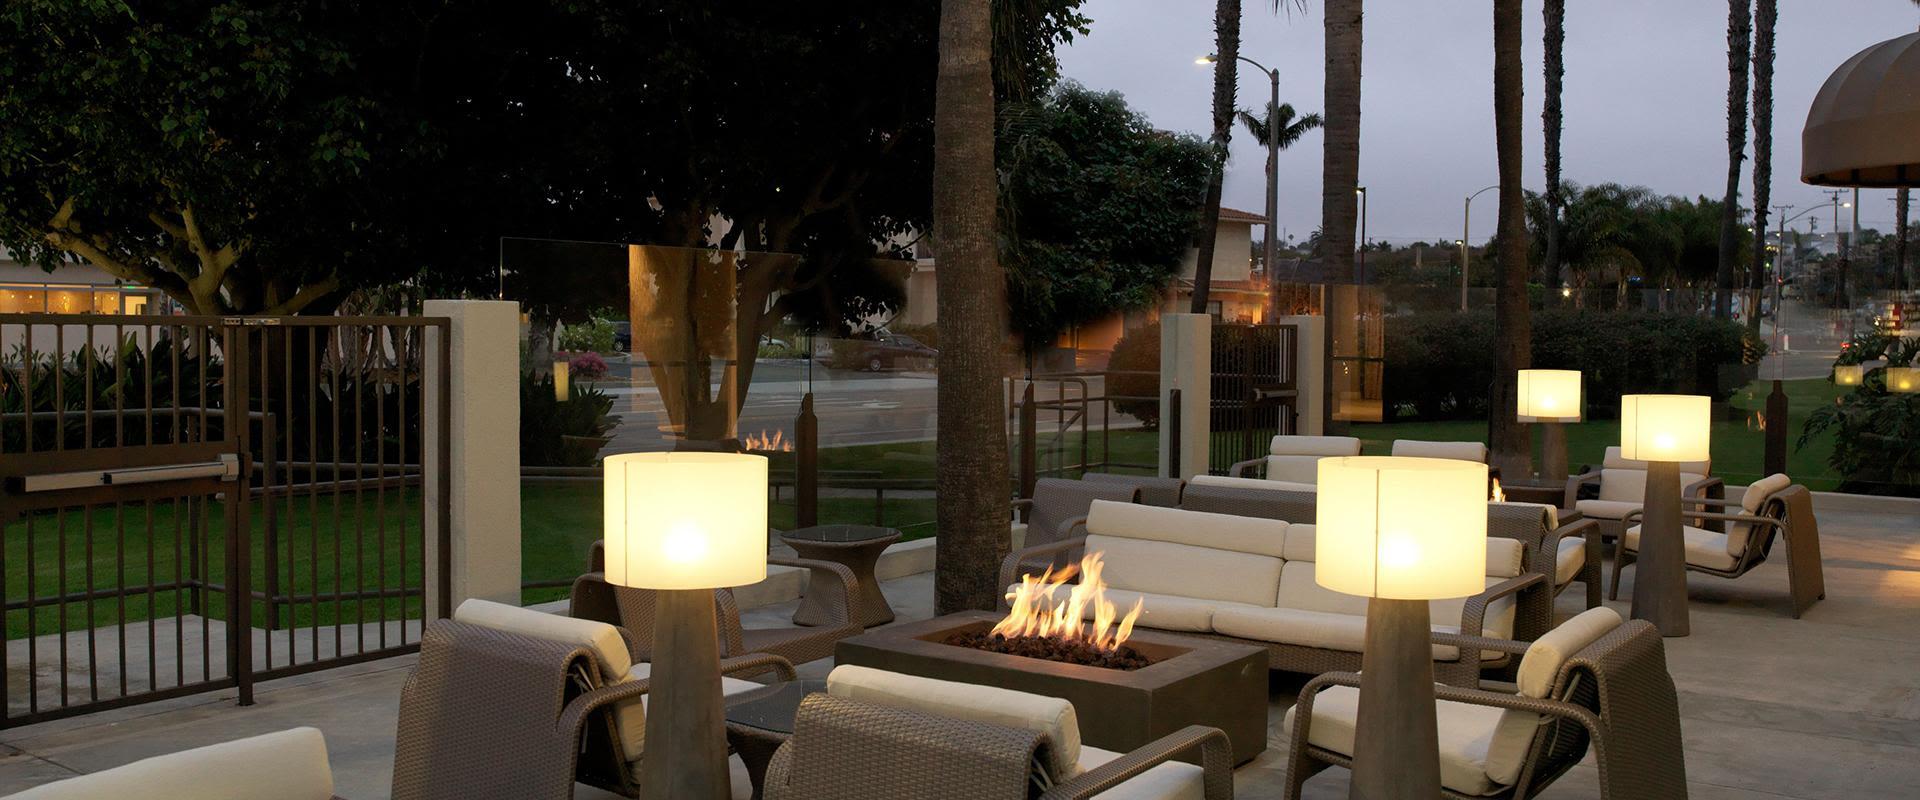 Redondo Beach SOl Restaurant Outdoor Patio